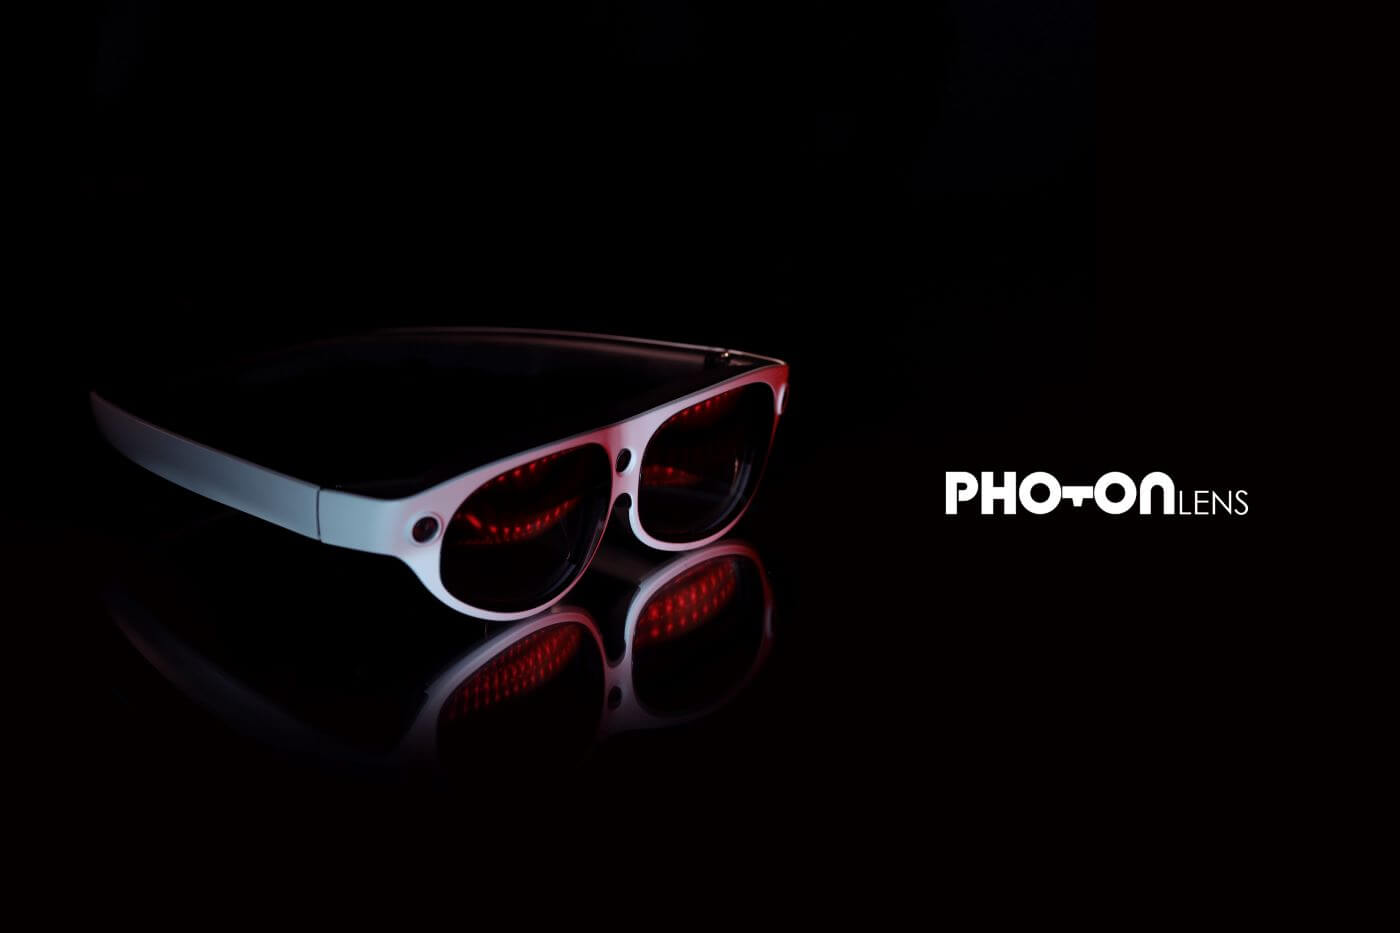 PhotonLens lunettes AR